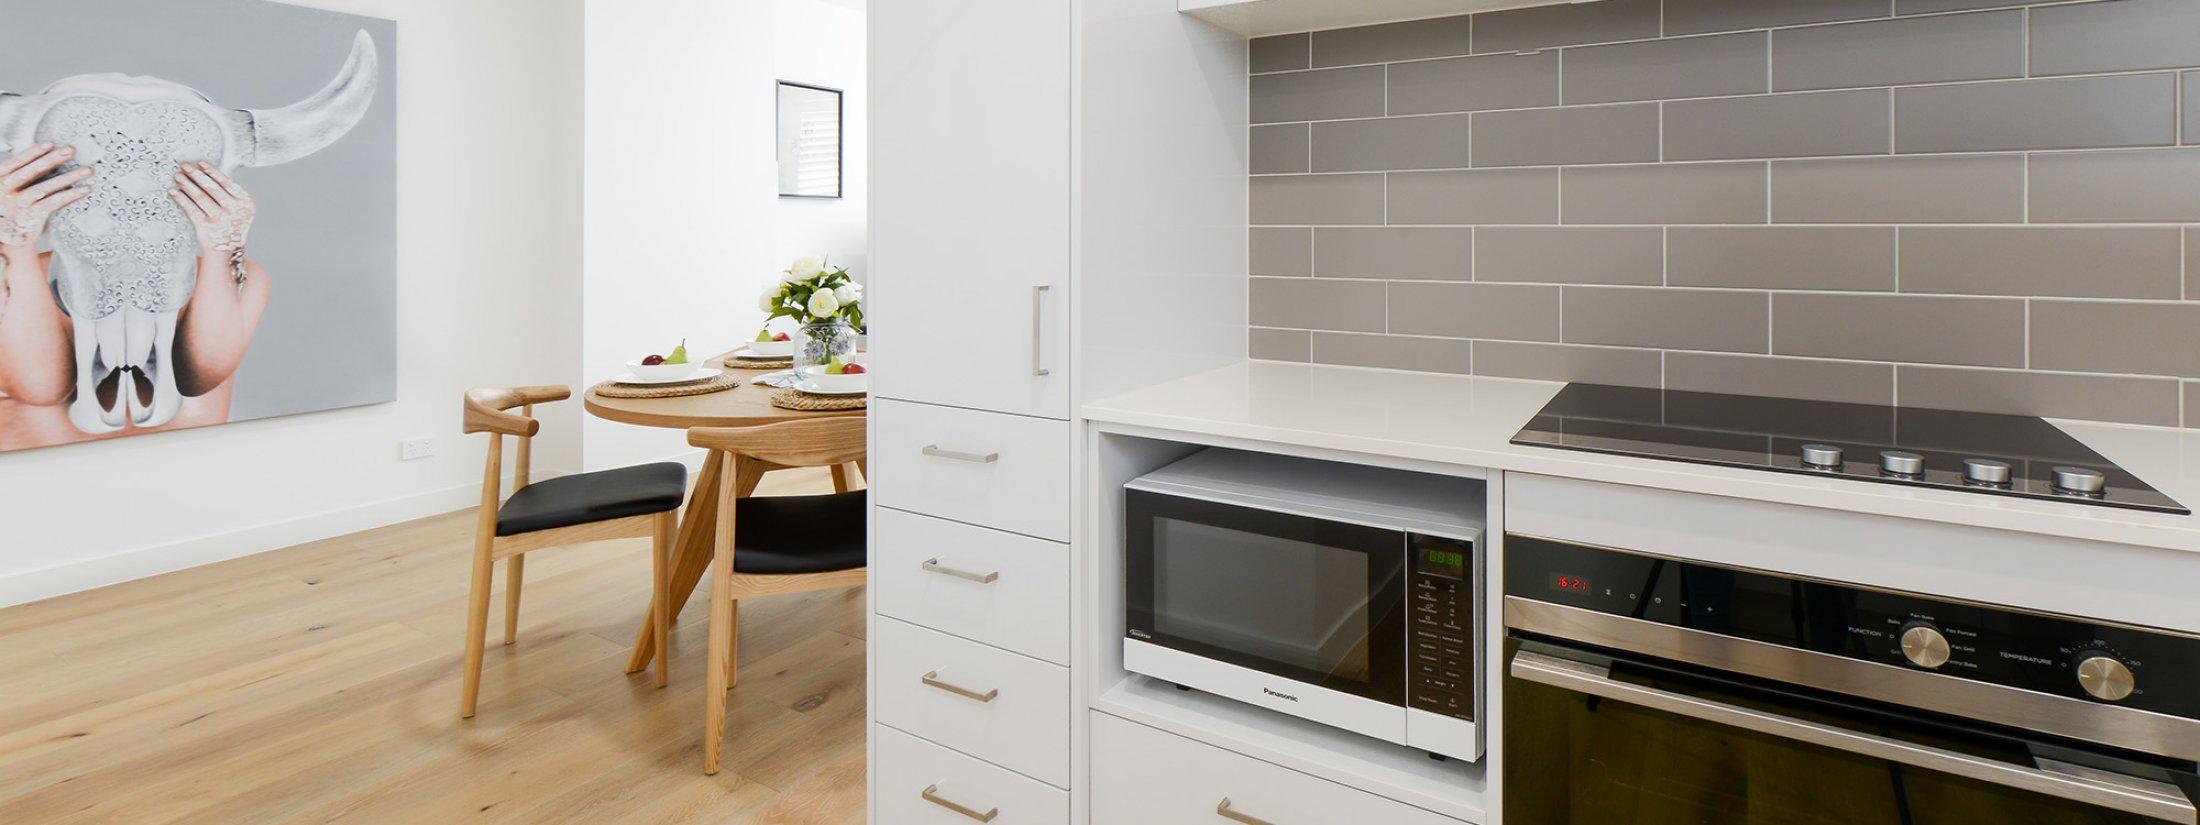 Hampton Lookout - Hampton - Kitchen Area and Dining Area